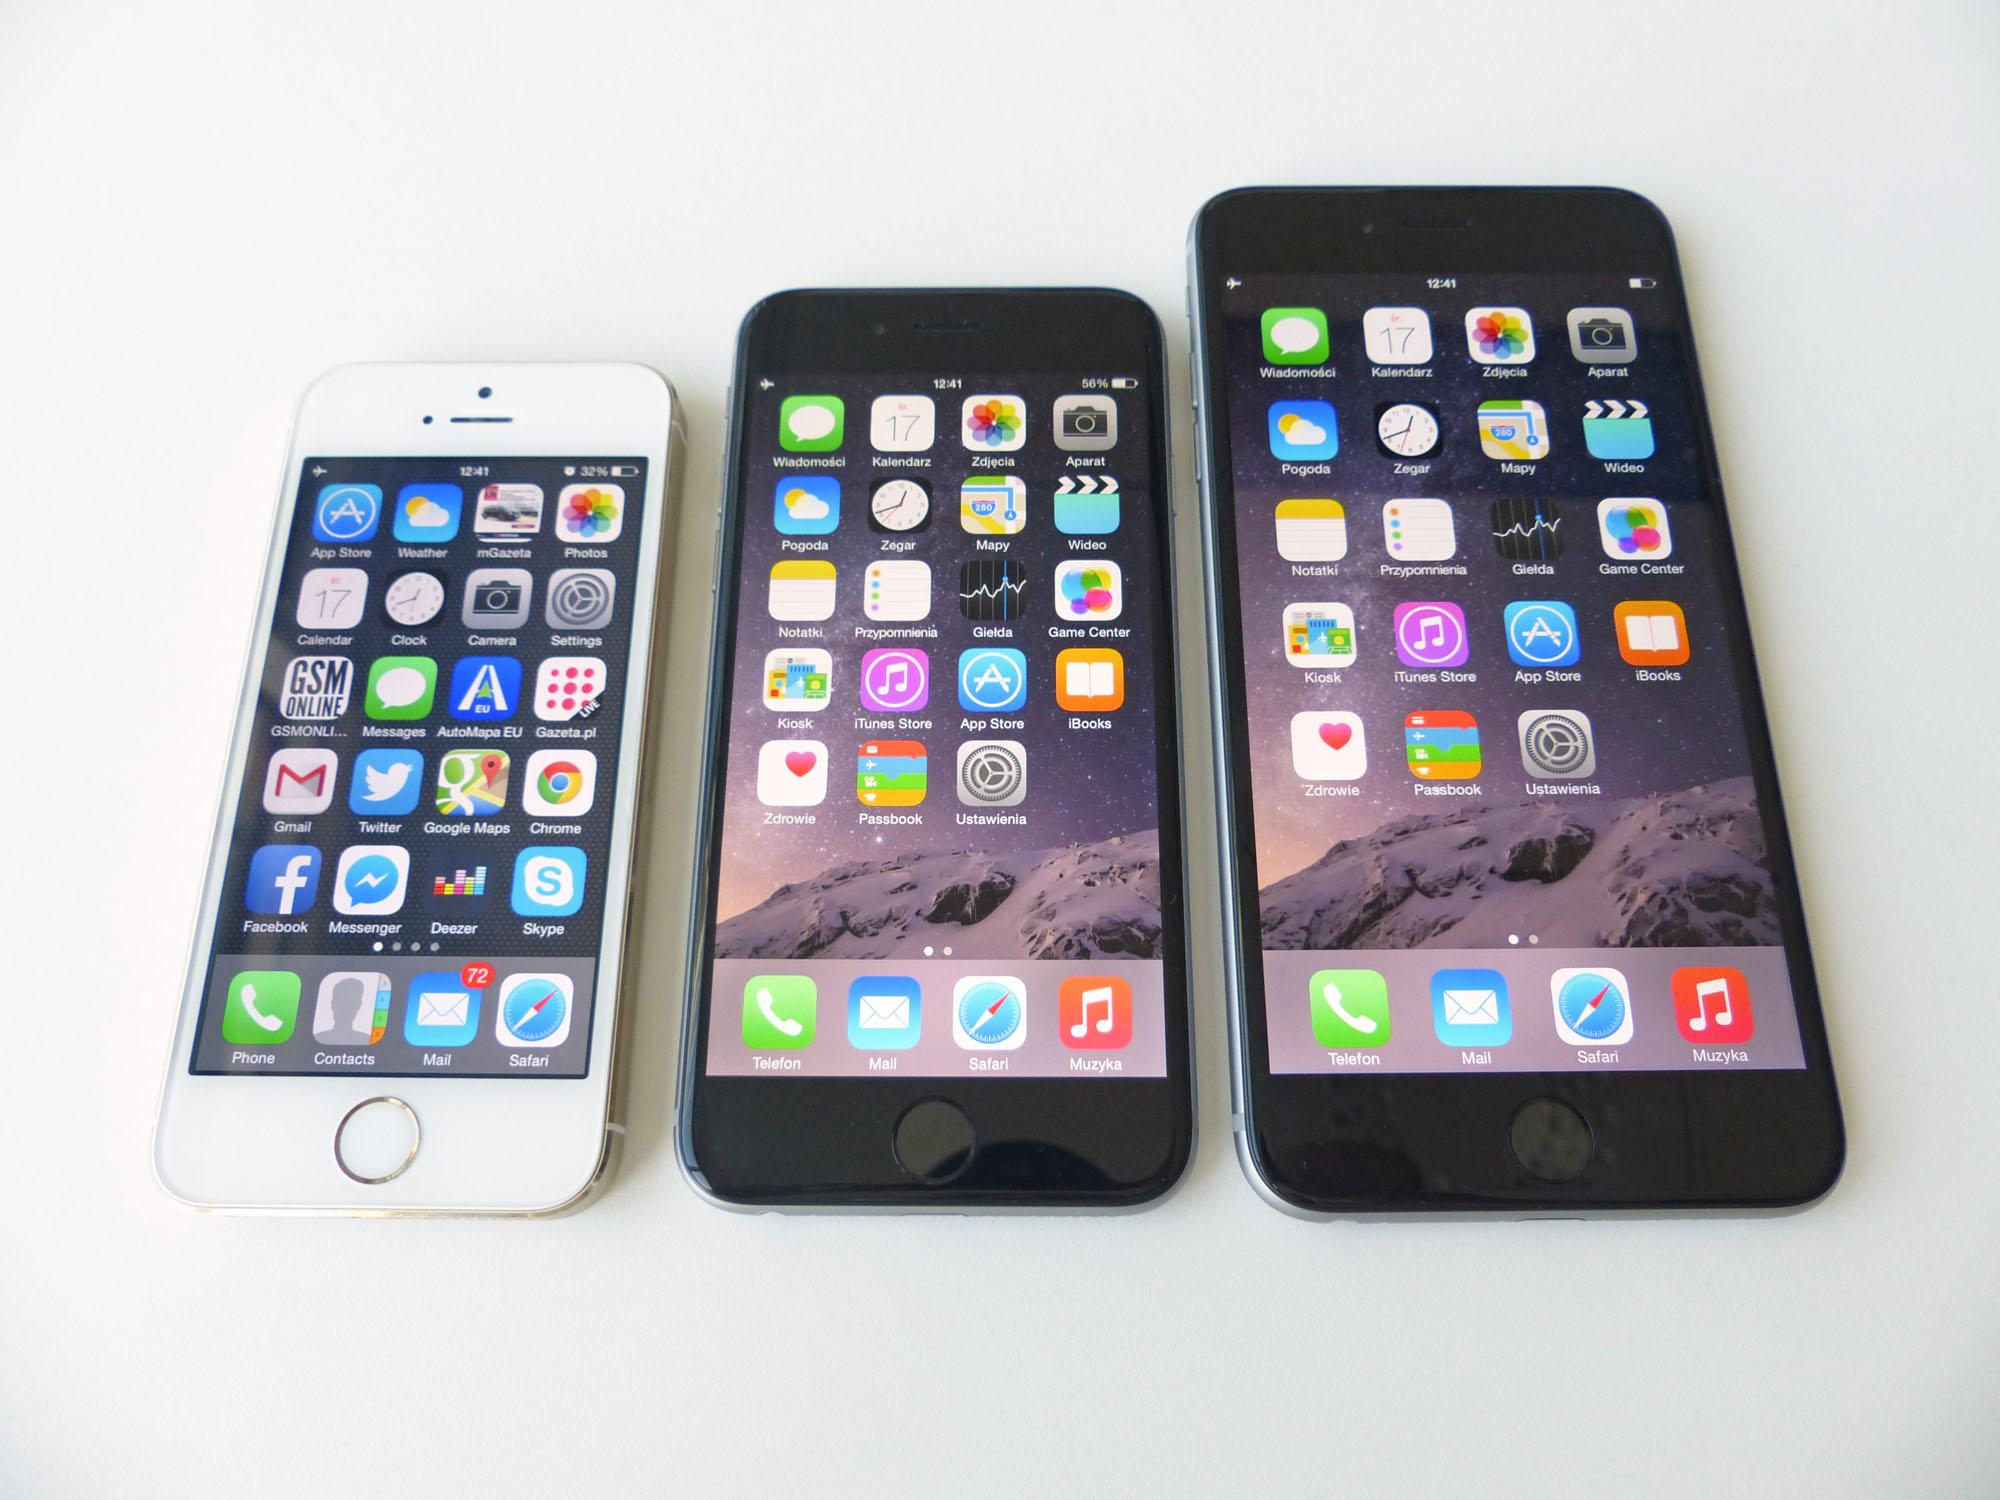 galeria zdj smartfon w iphone 6 i iphone 6 plus. Black Bedroom Furniture Sets. Home Design Ideas